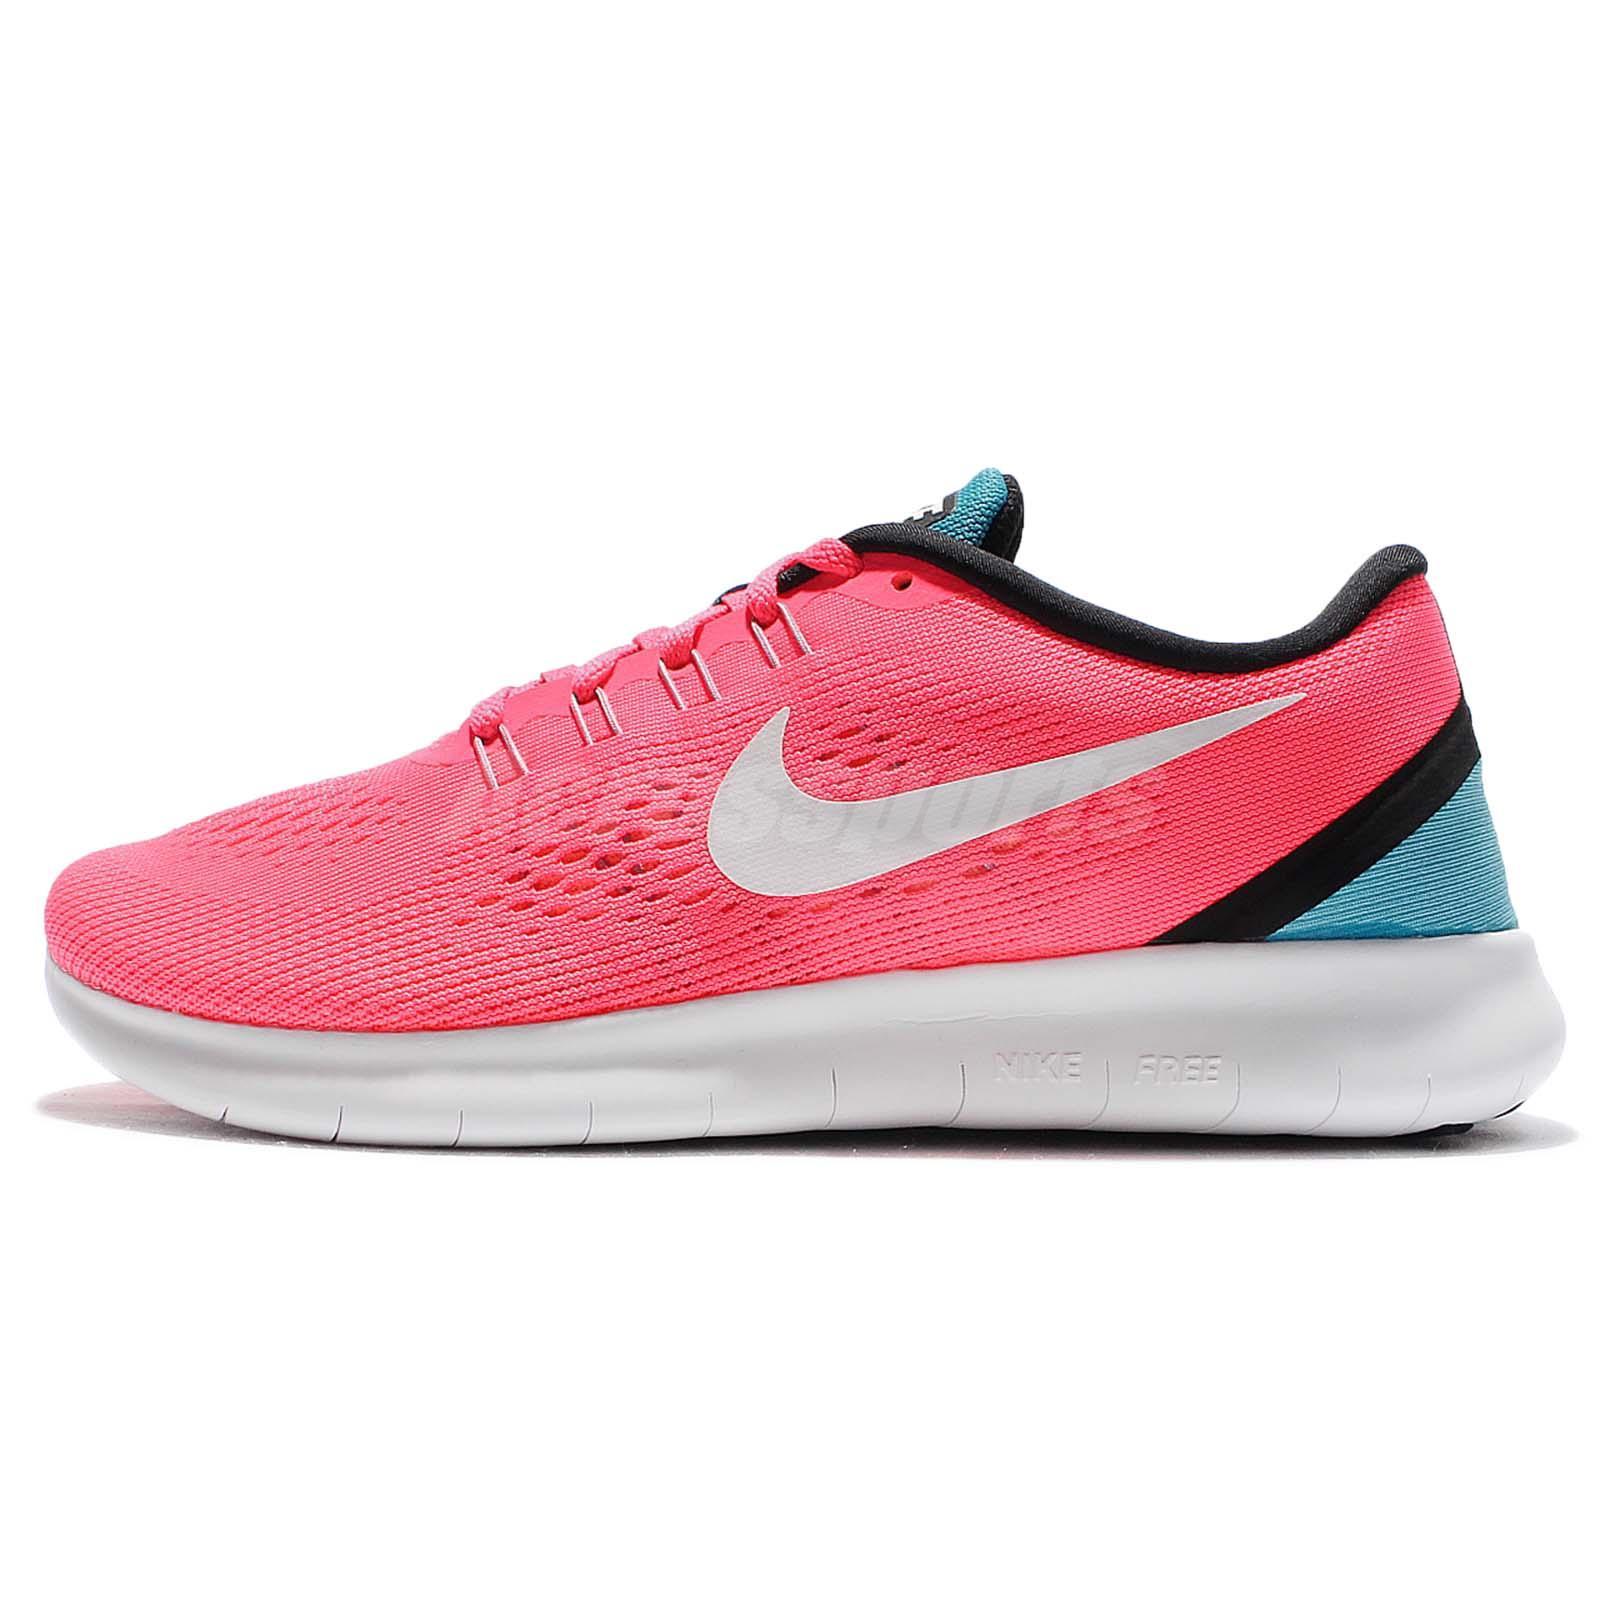 b60135c0e935 Wmns Nike Free RN Run Pink Blue Women Running Shoes Sneakers Trainers  831509-602